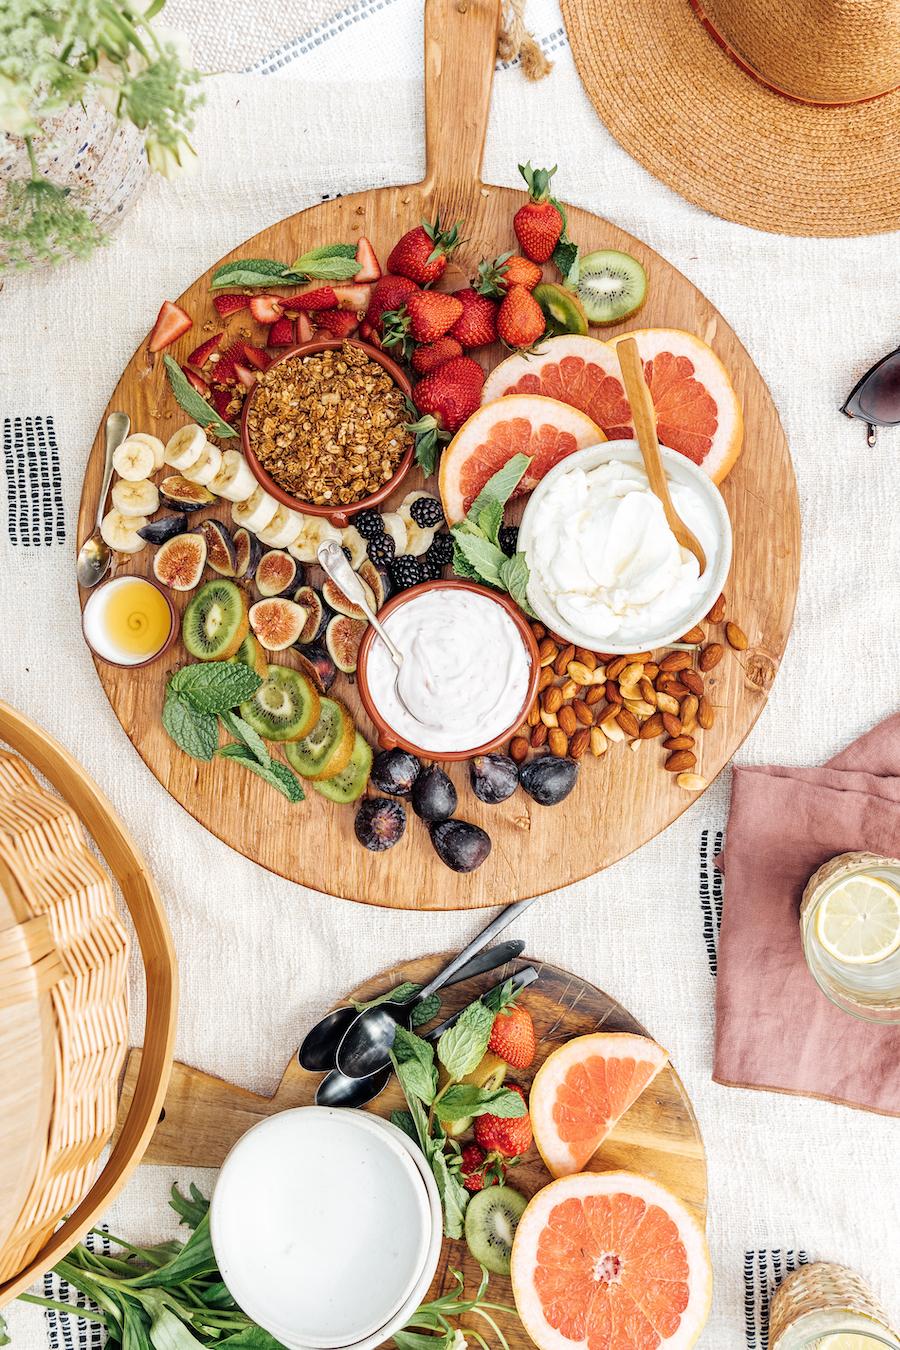 Yogurt & Granola Breakfast Grazing Board for a Mother's Day Picnic